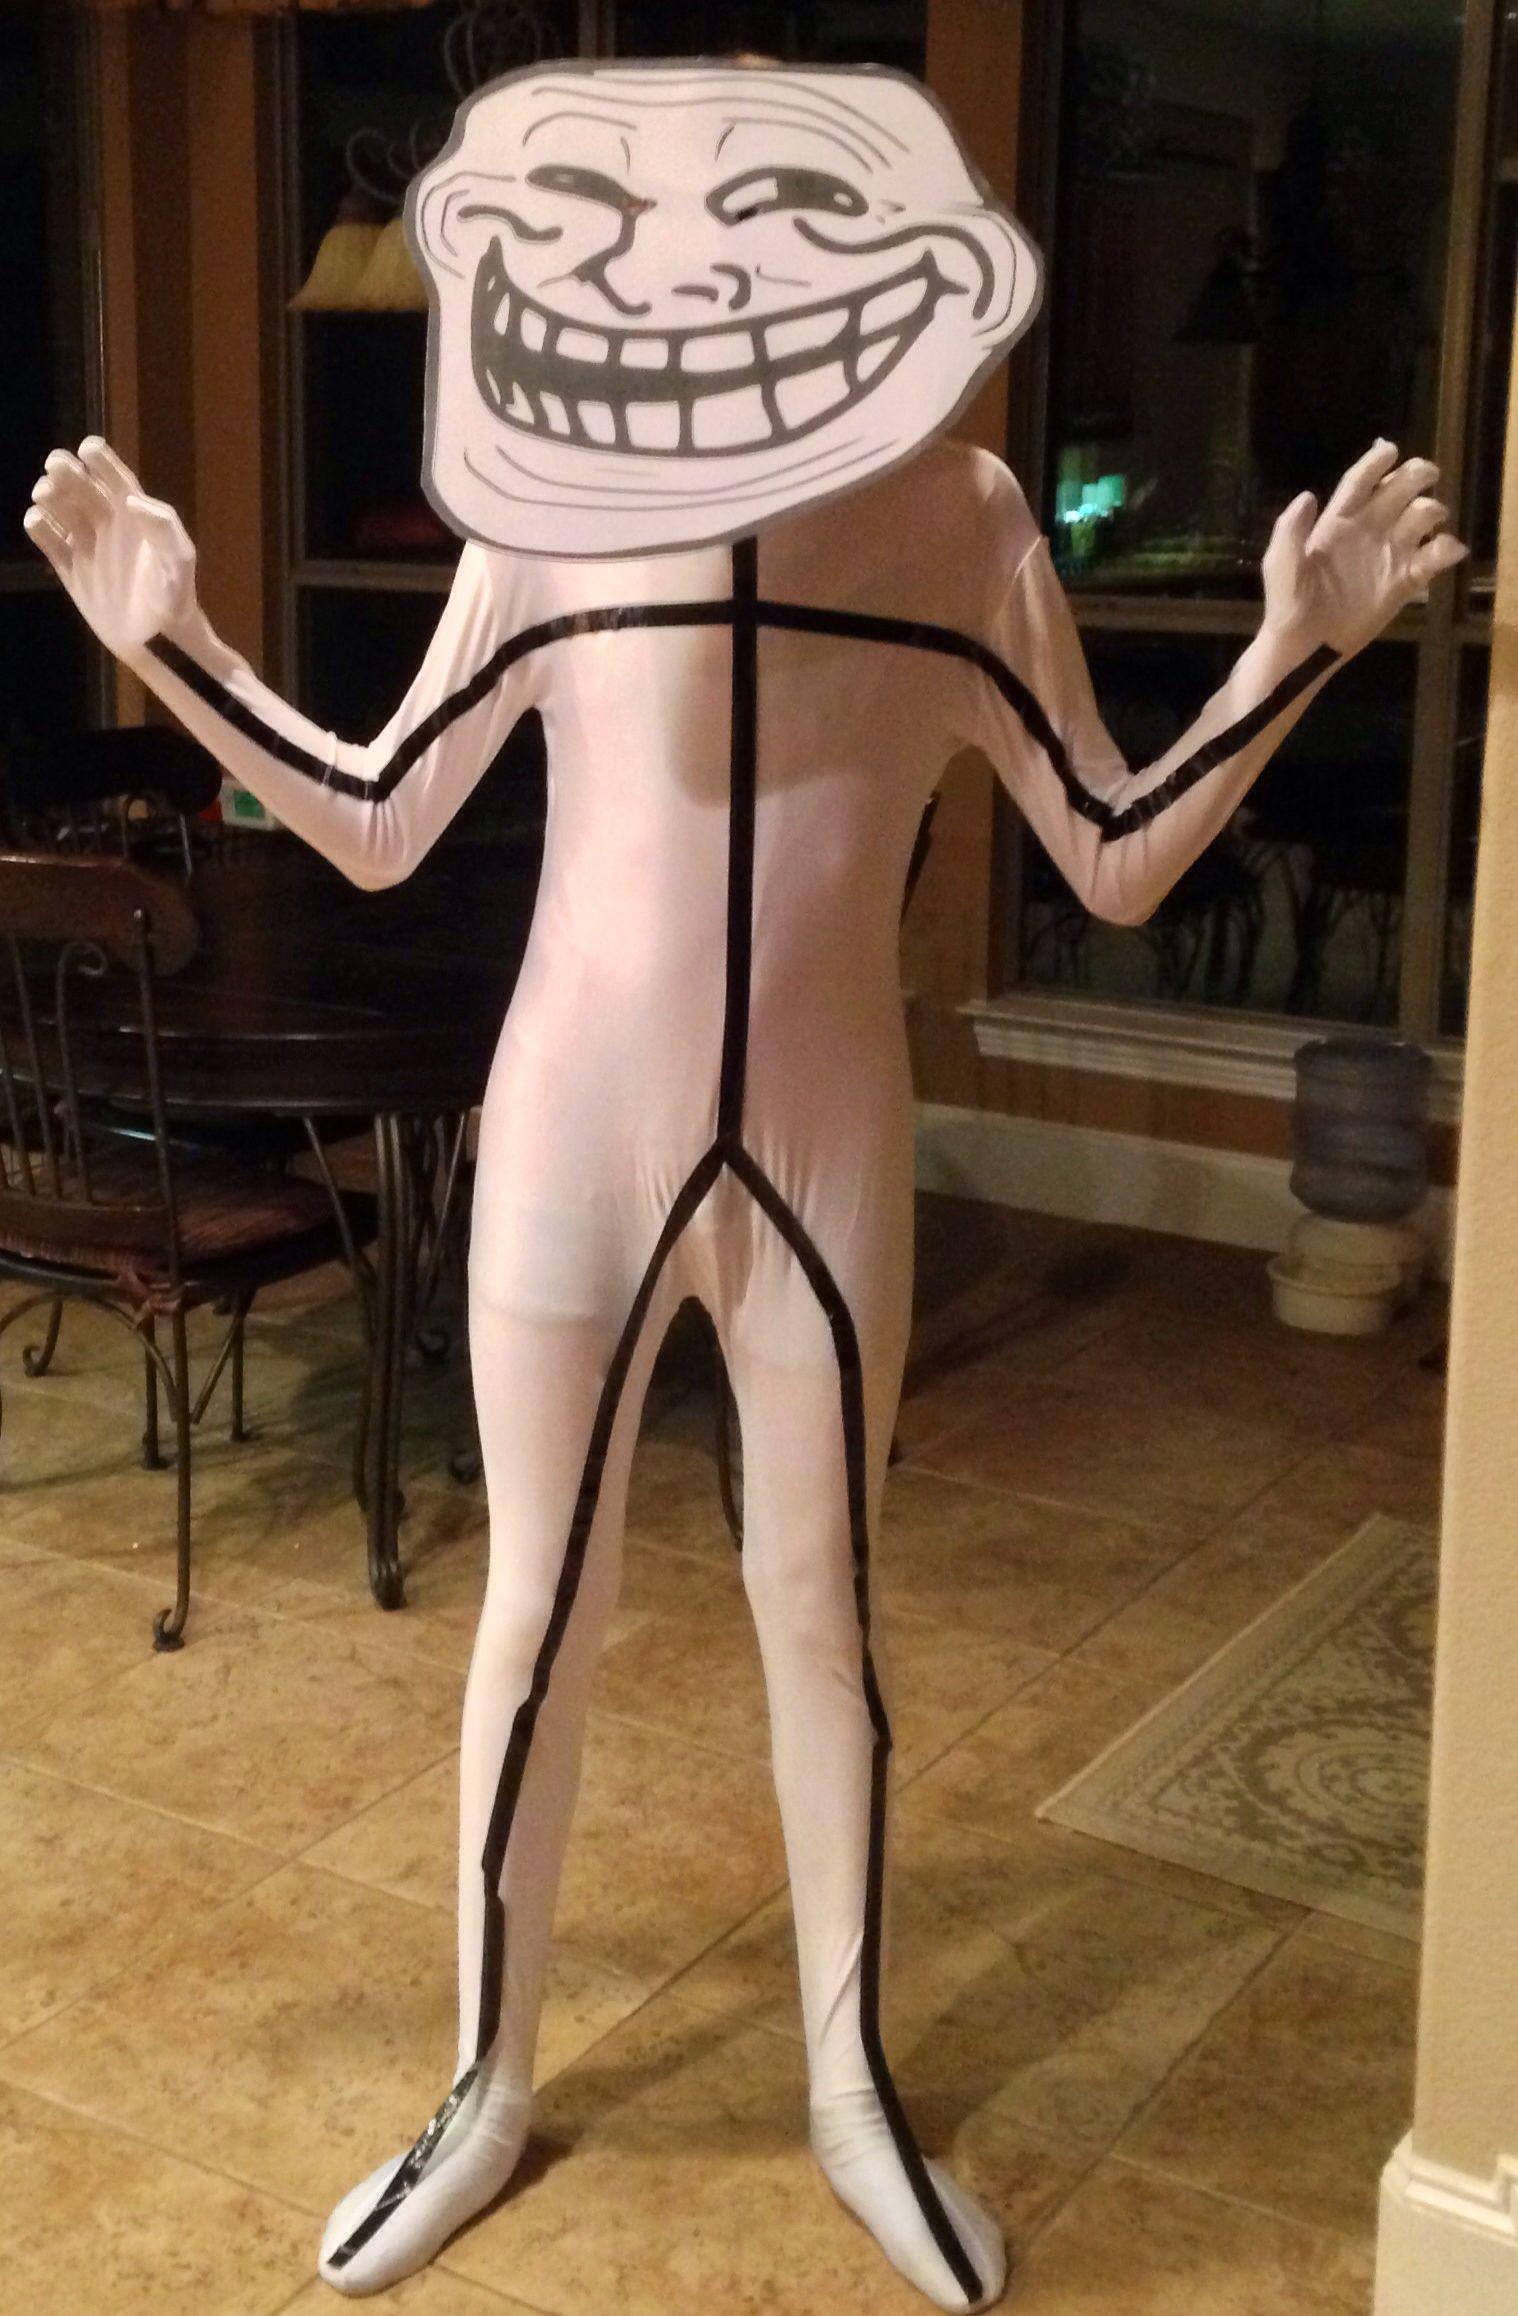 7db1547f316d0910e6aec8768d1dda3d troll face internet meme costume trollface umad halloween